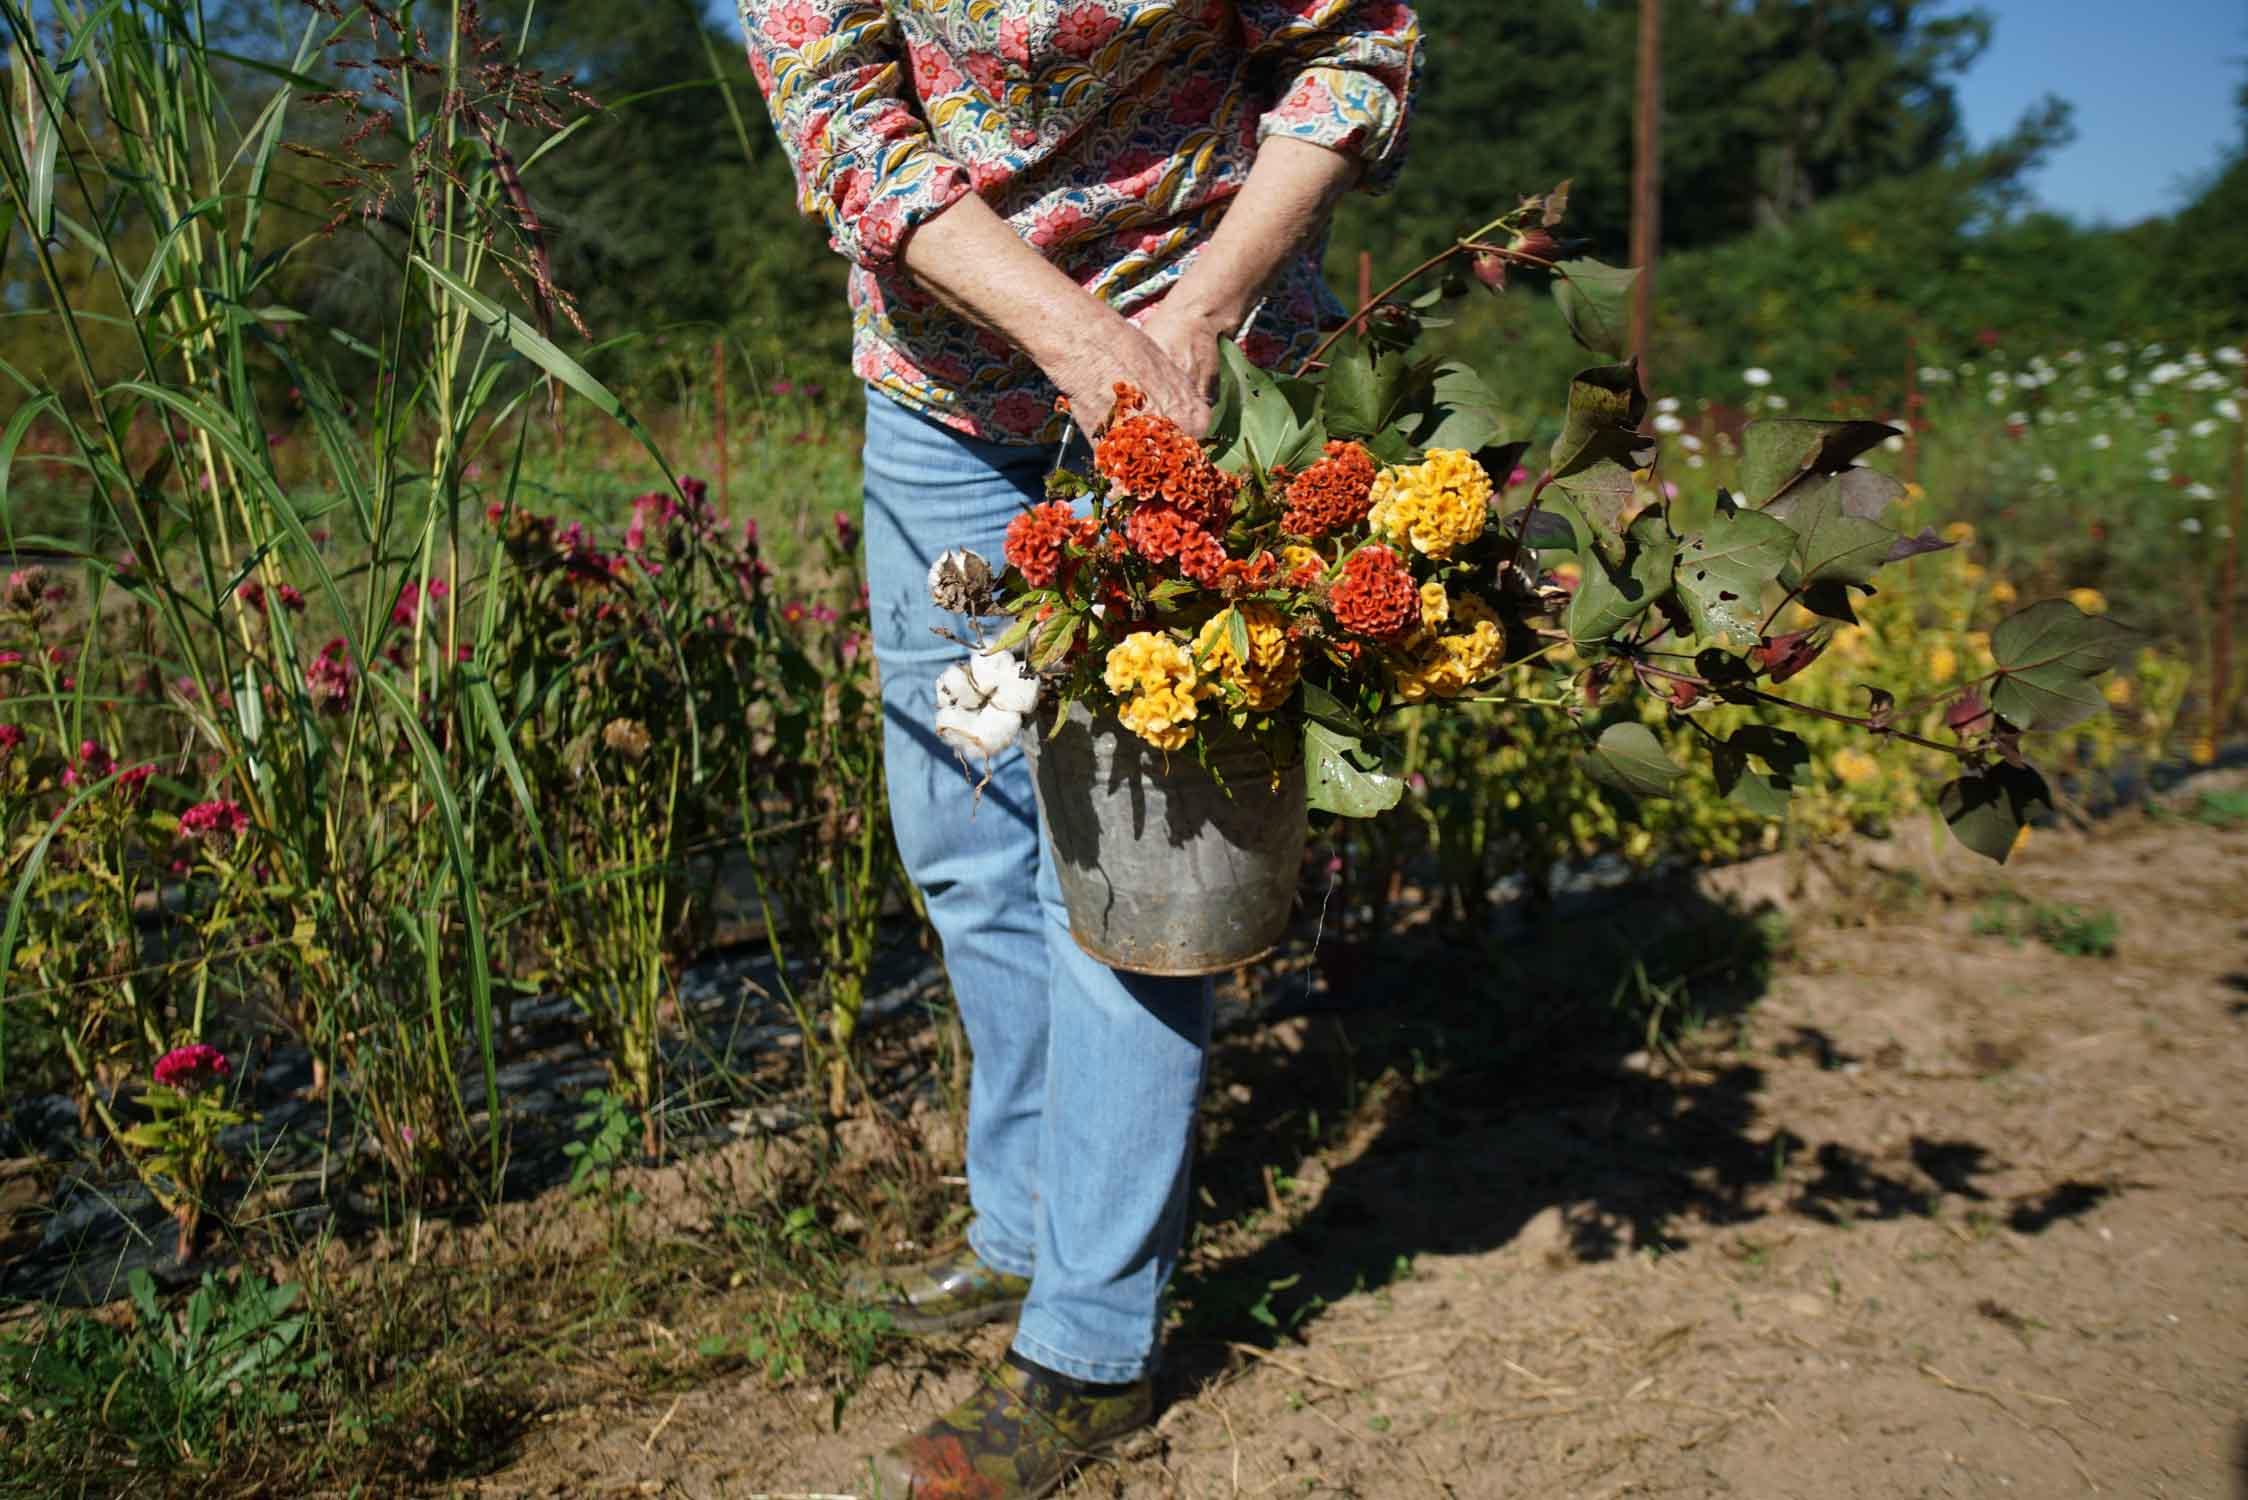 RA_3 porch farm flower social-2016101708871.jpg